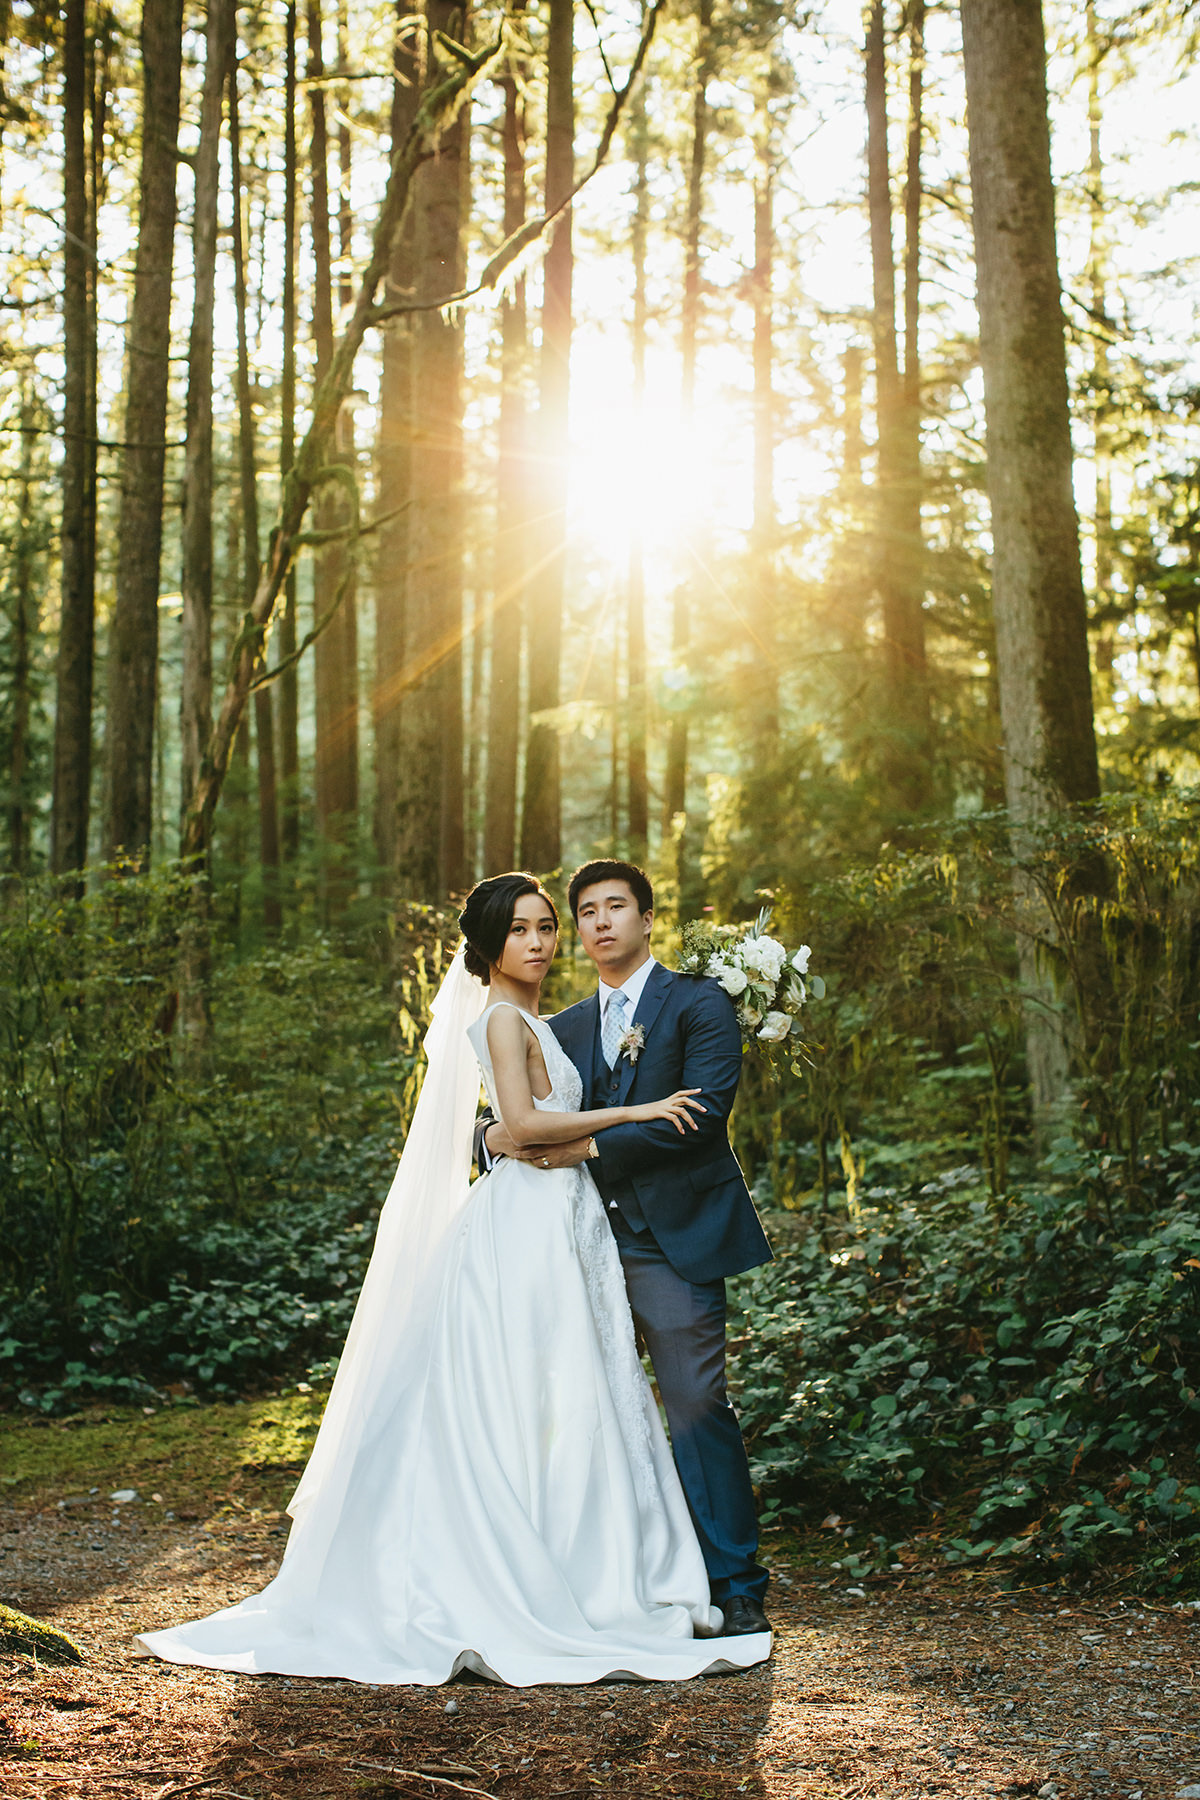 rainforest wedding photos Vancouver www.lucida-photography.com